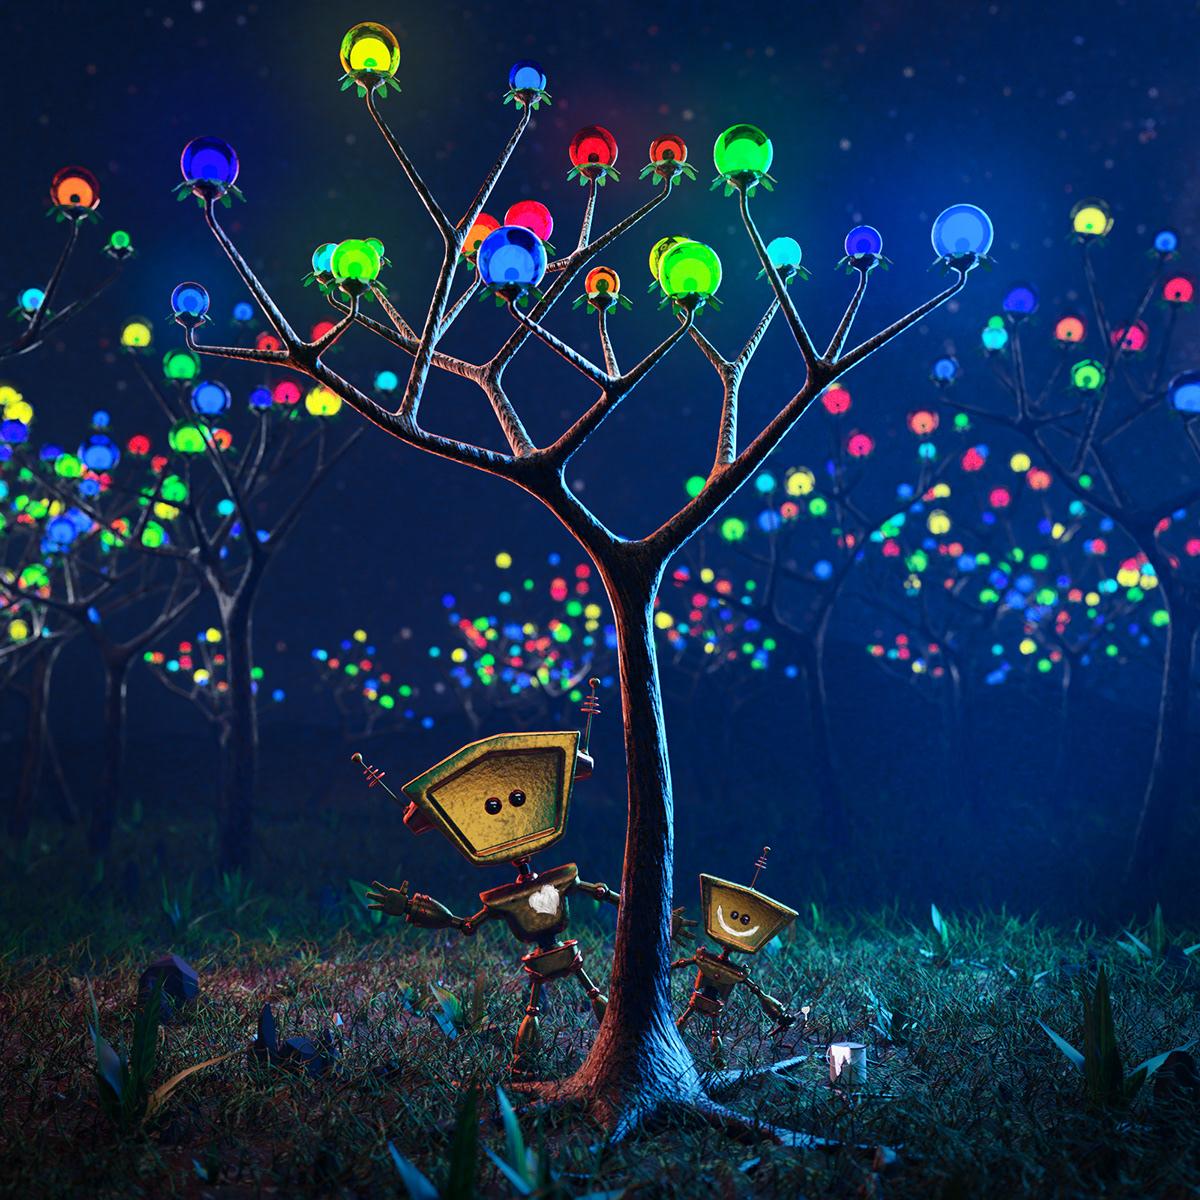 blender photoshop Digital Art  robot Tree  lights night colors Love paint